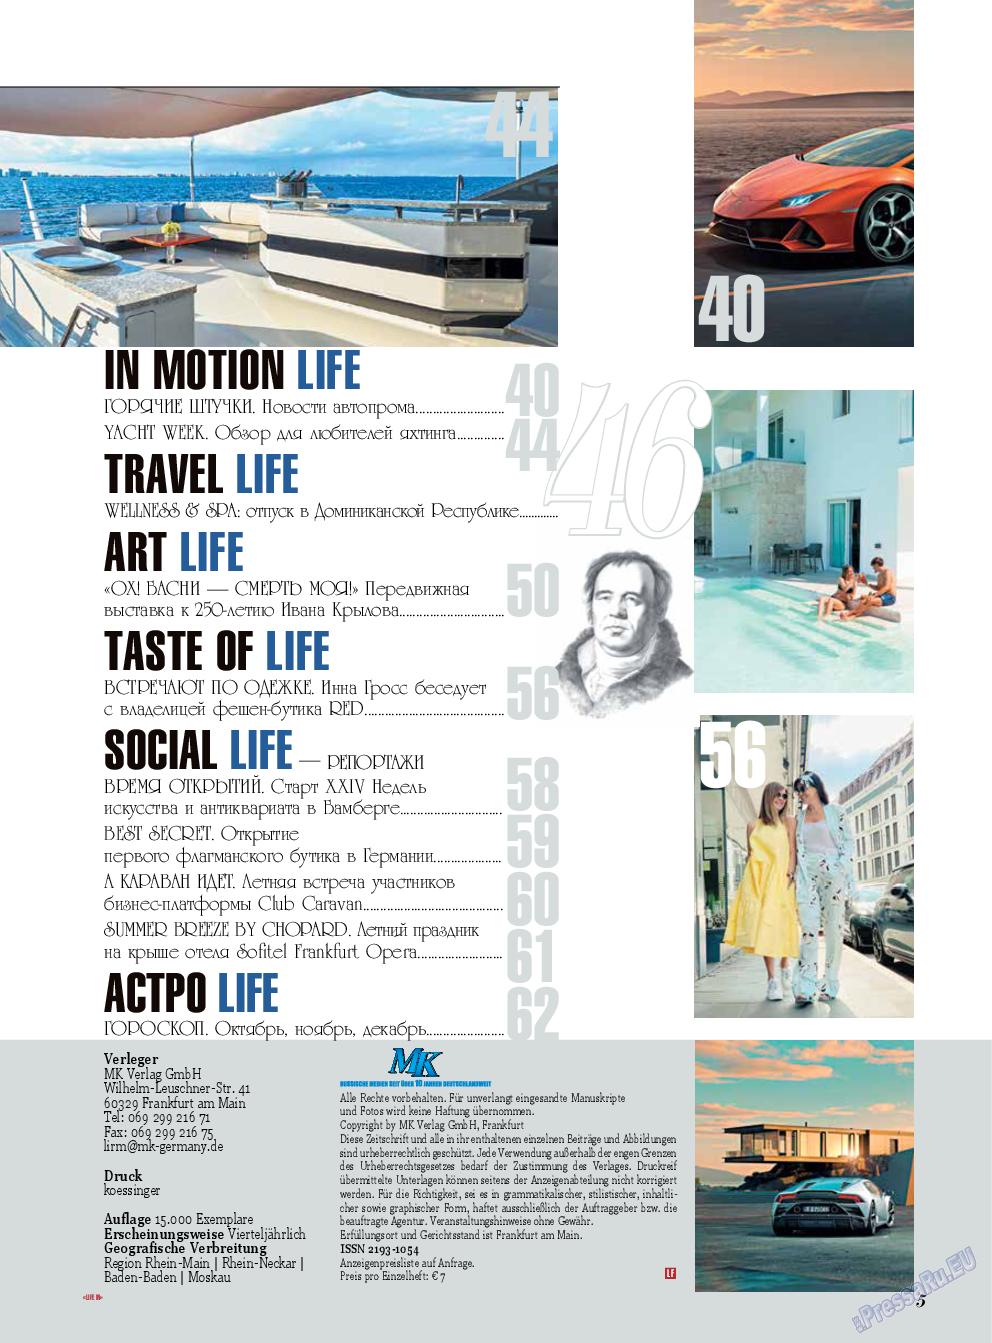 Life in Франкфурт (журнал). 2019 год, номер 44, стр. 5